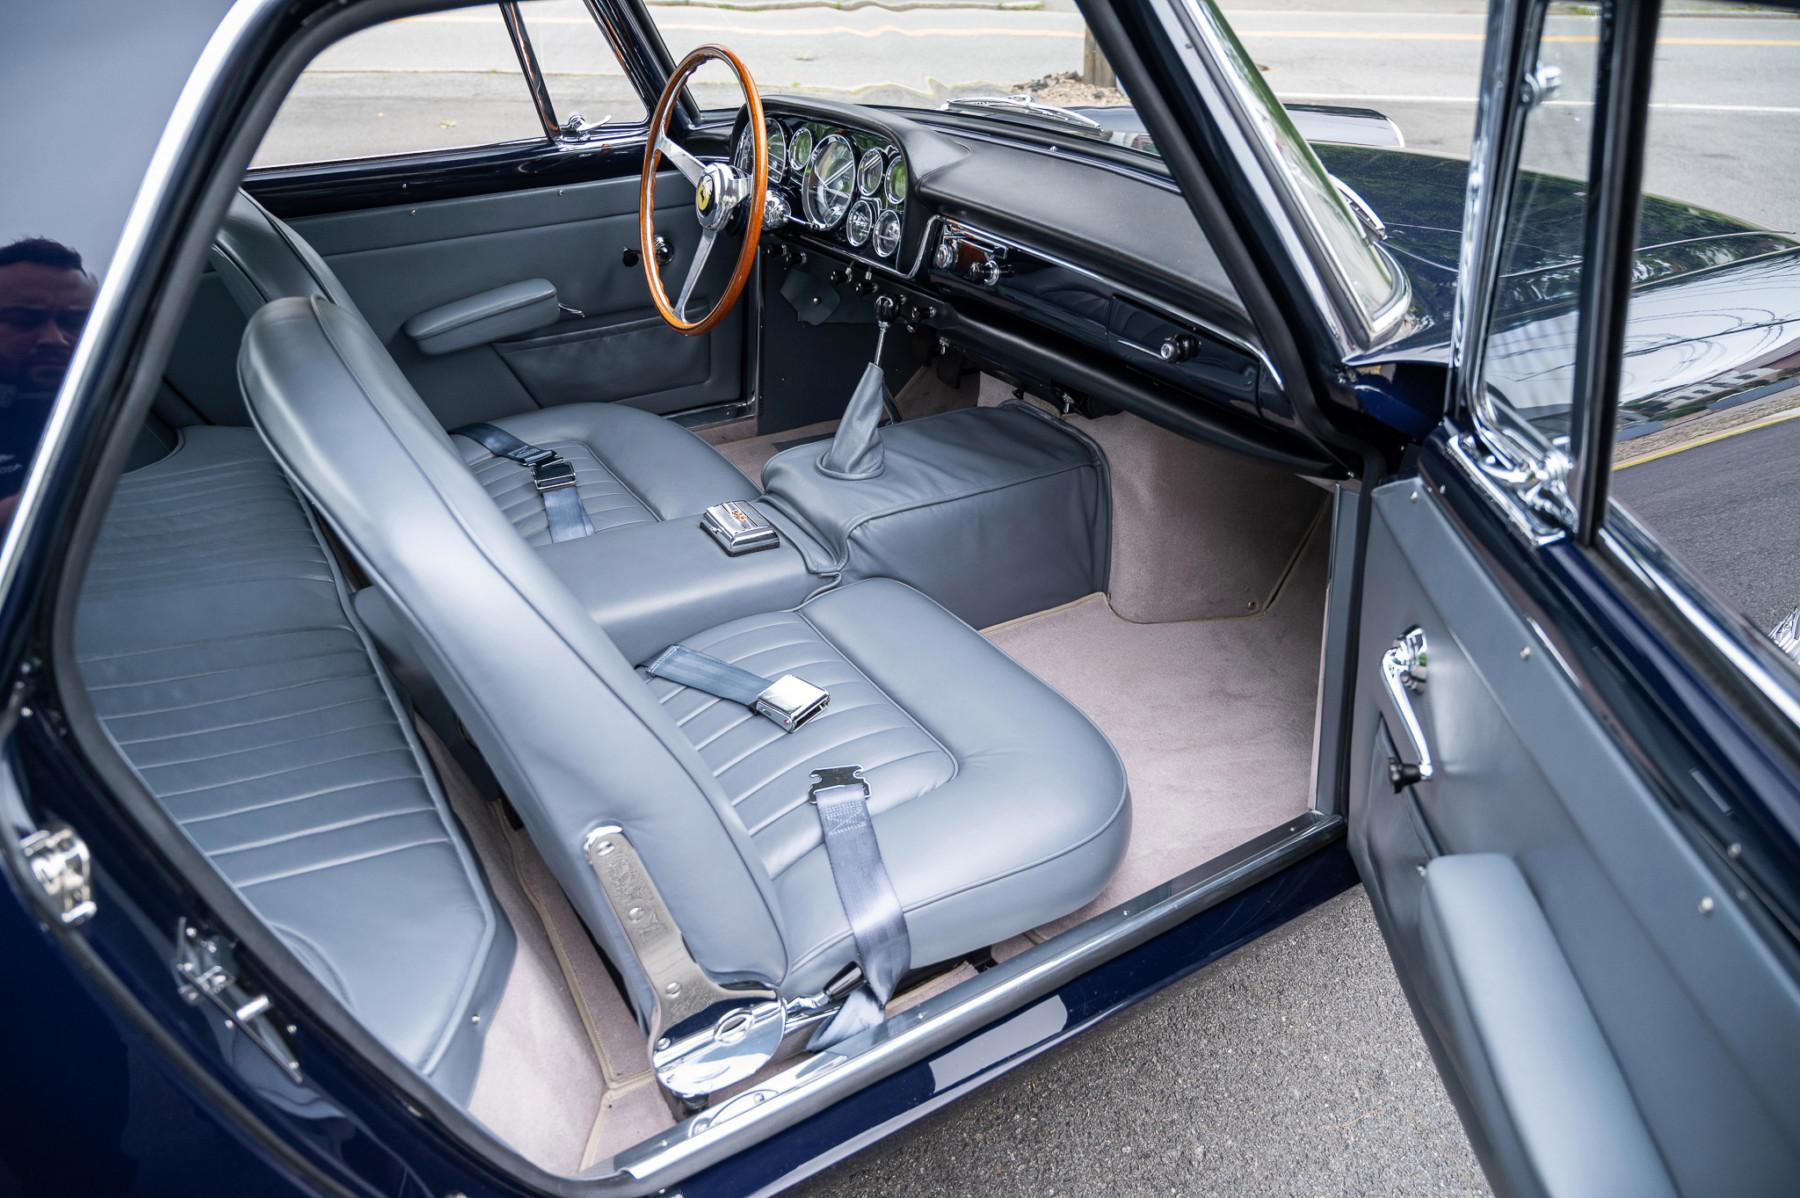 1960 Ferrari 250 GT Pinin Farina Coupe 13